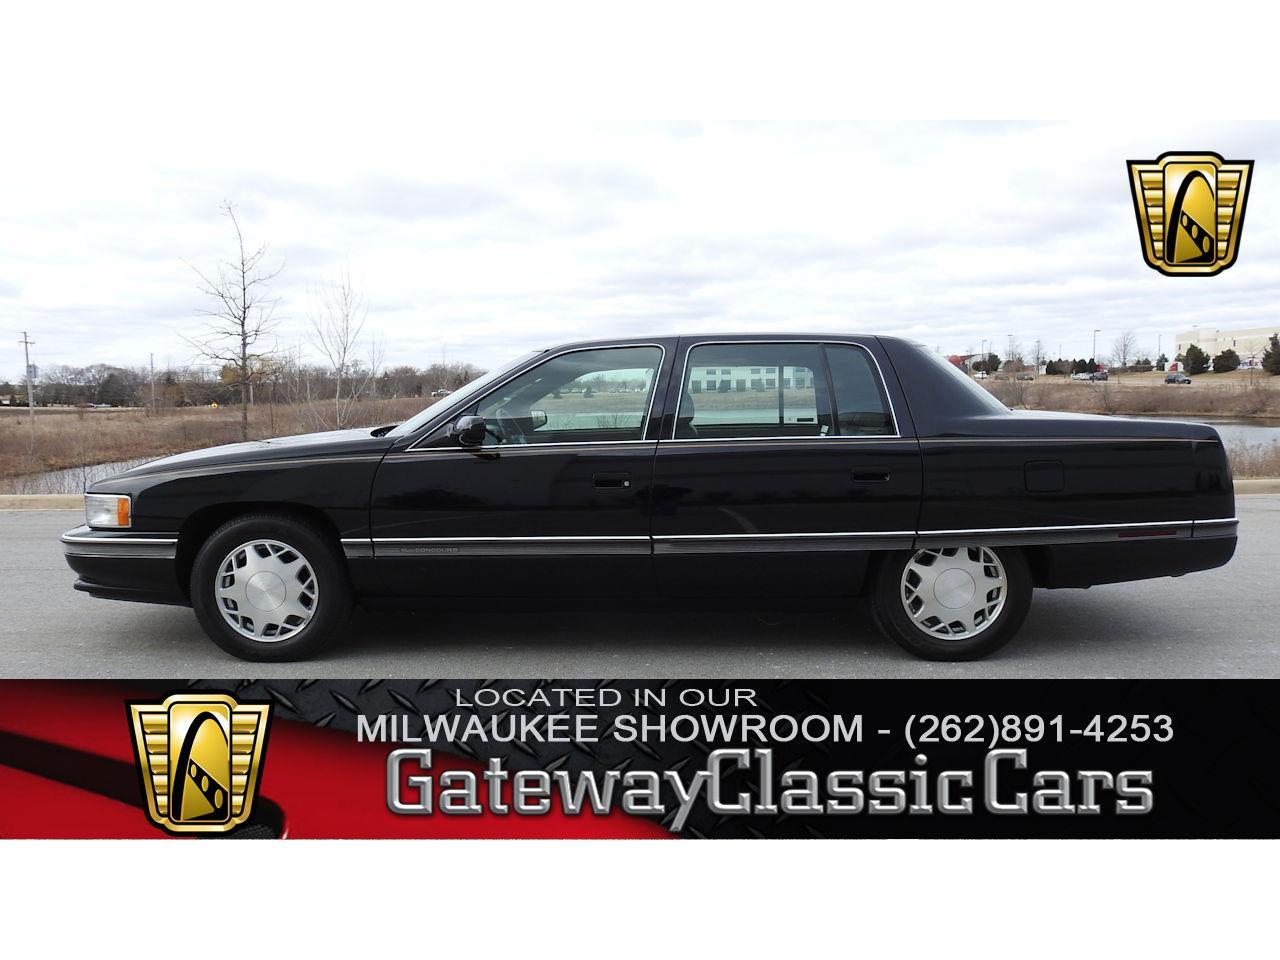 1995 cadillac deville for sale classiccars com cc 1076765 1995 cadillac deville for sale